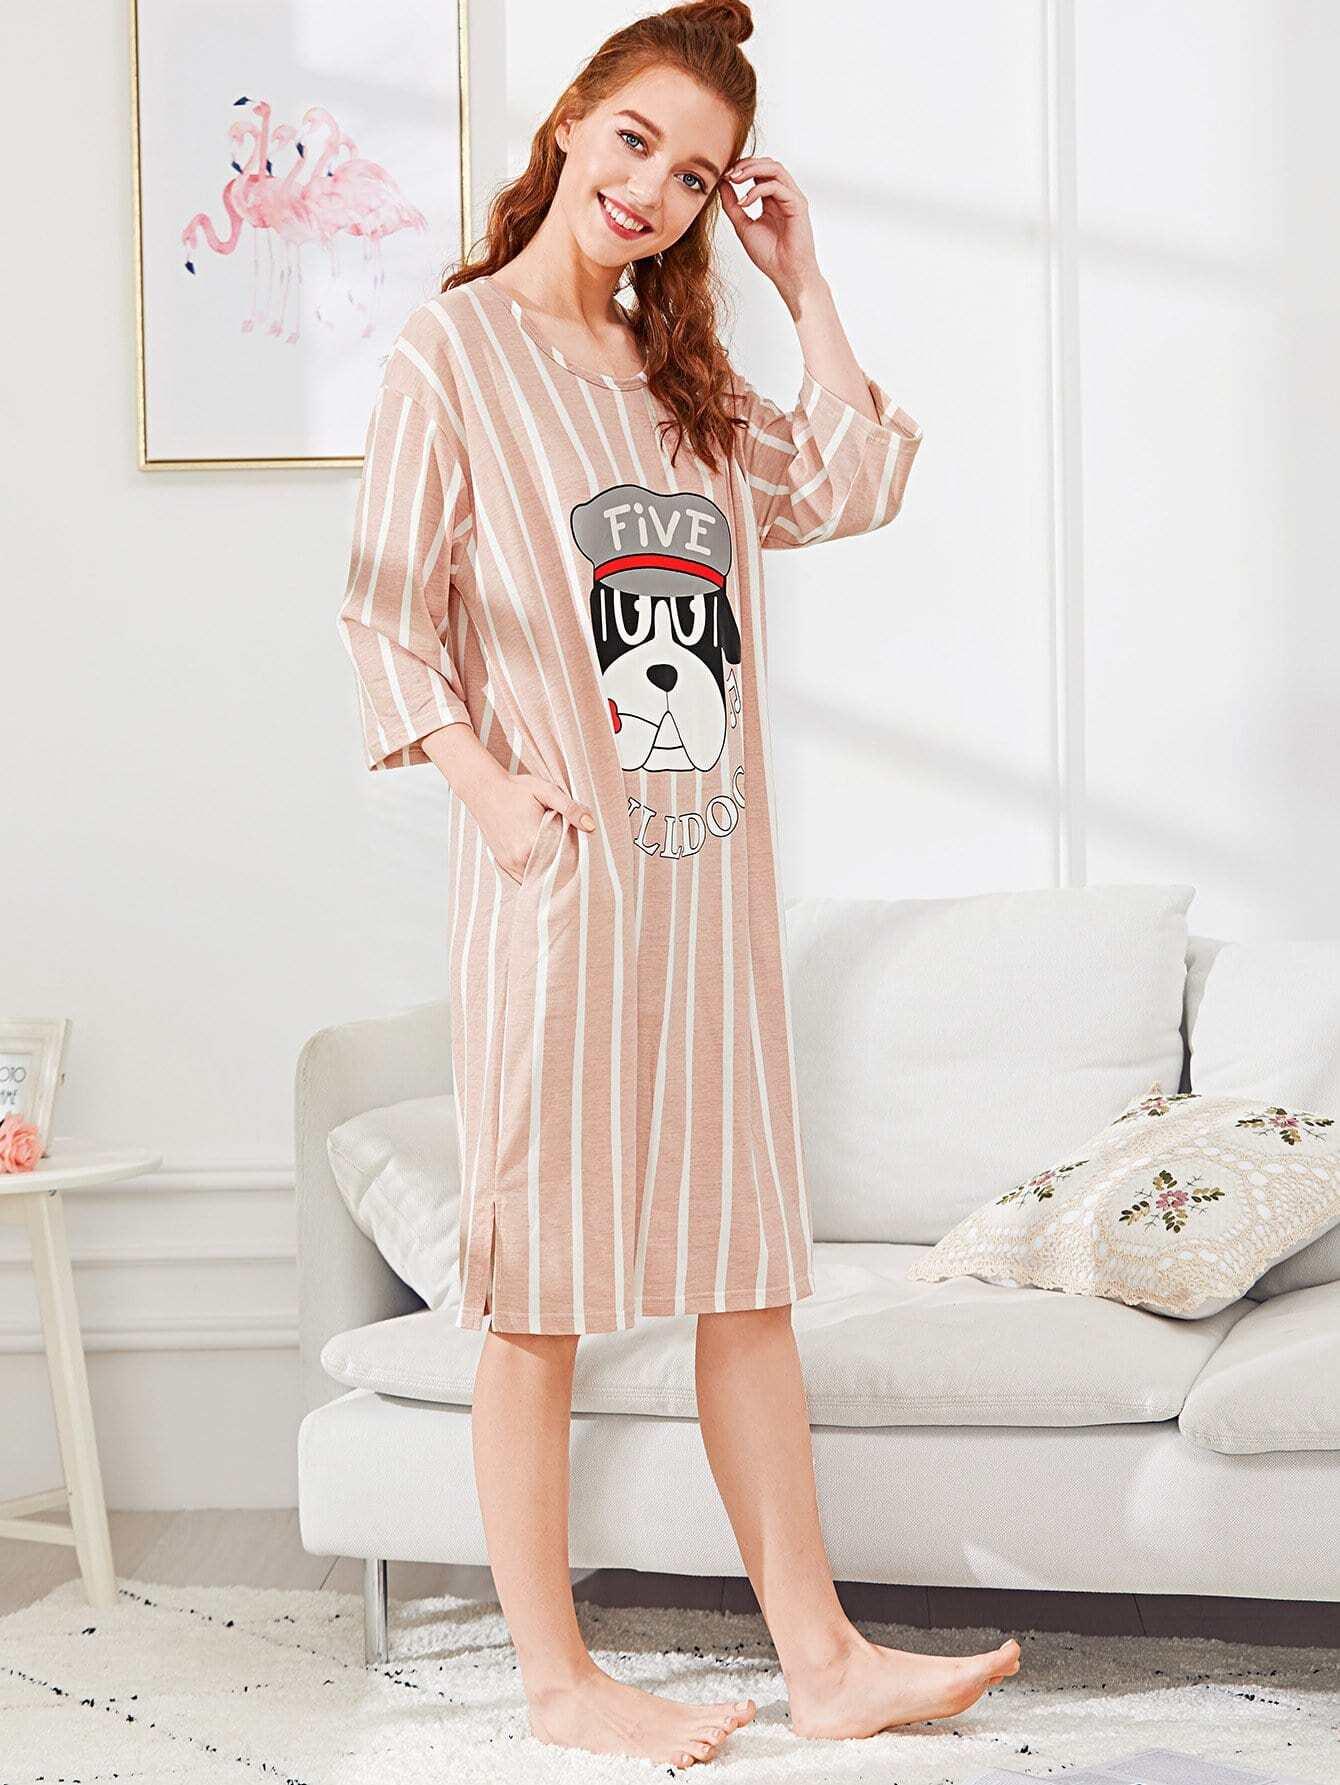 Dog Print Striped Dress